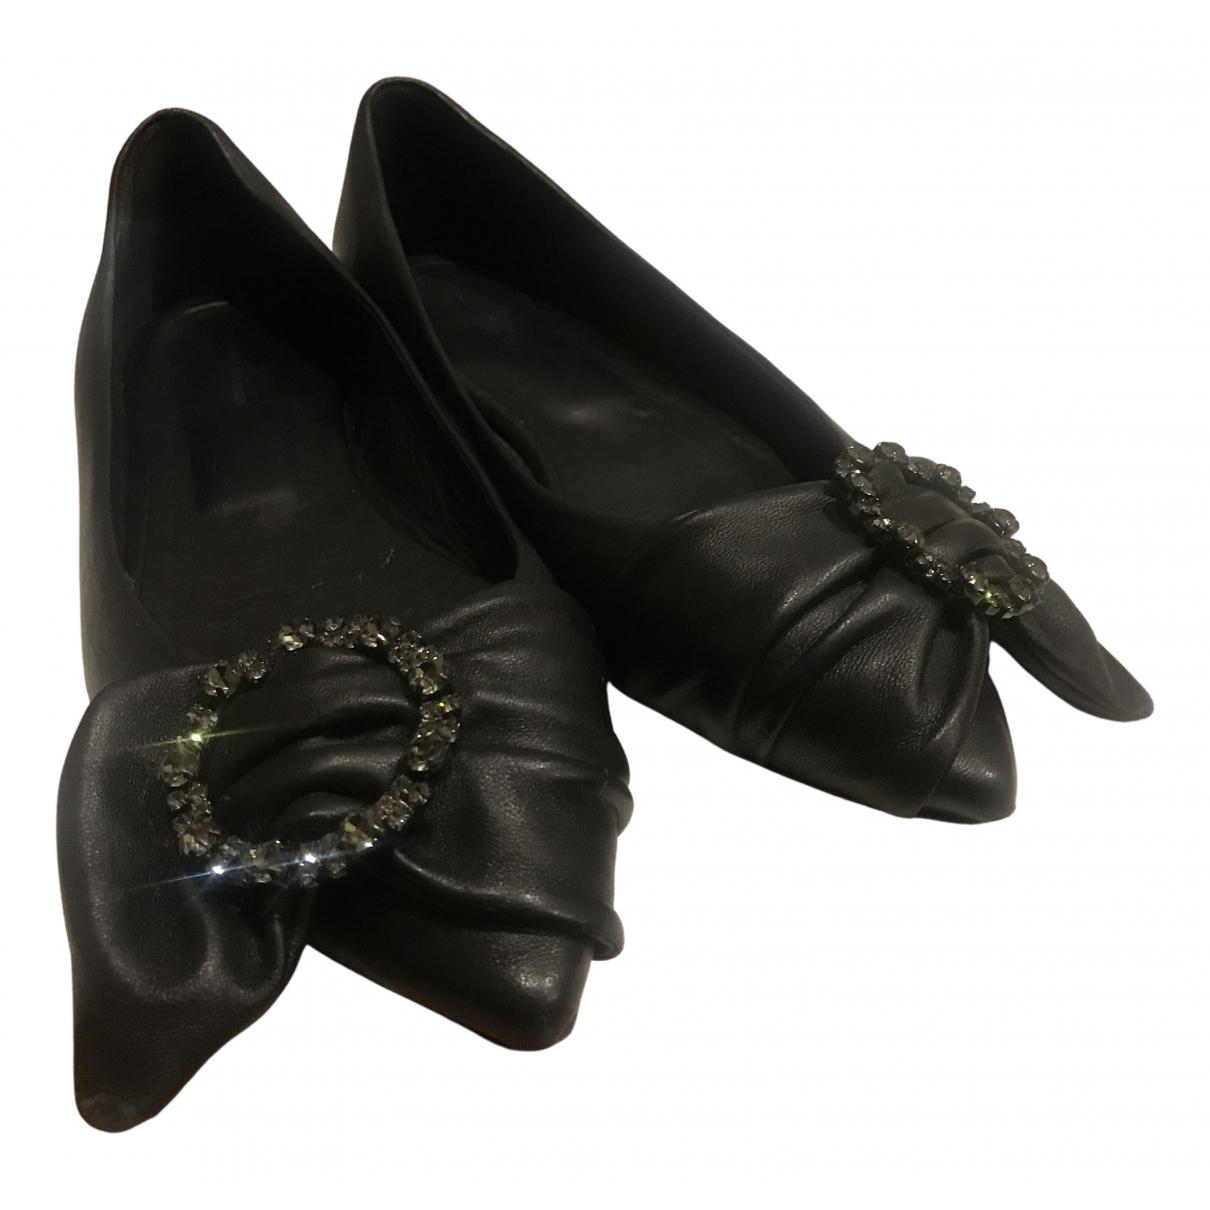 Isabel Marant N Black Leather Flats for Women 38 EU